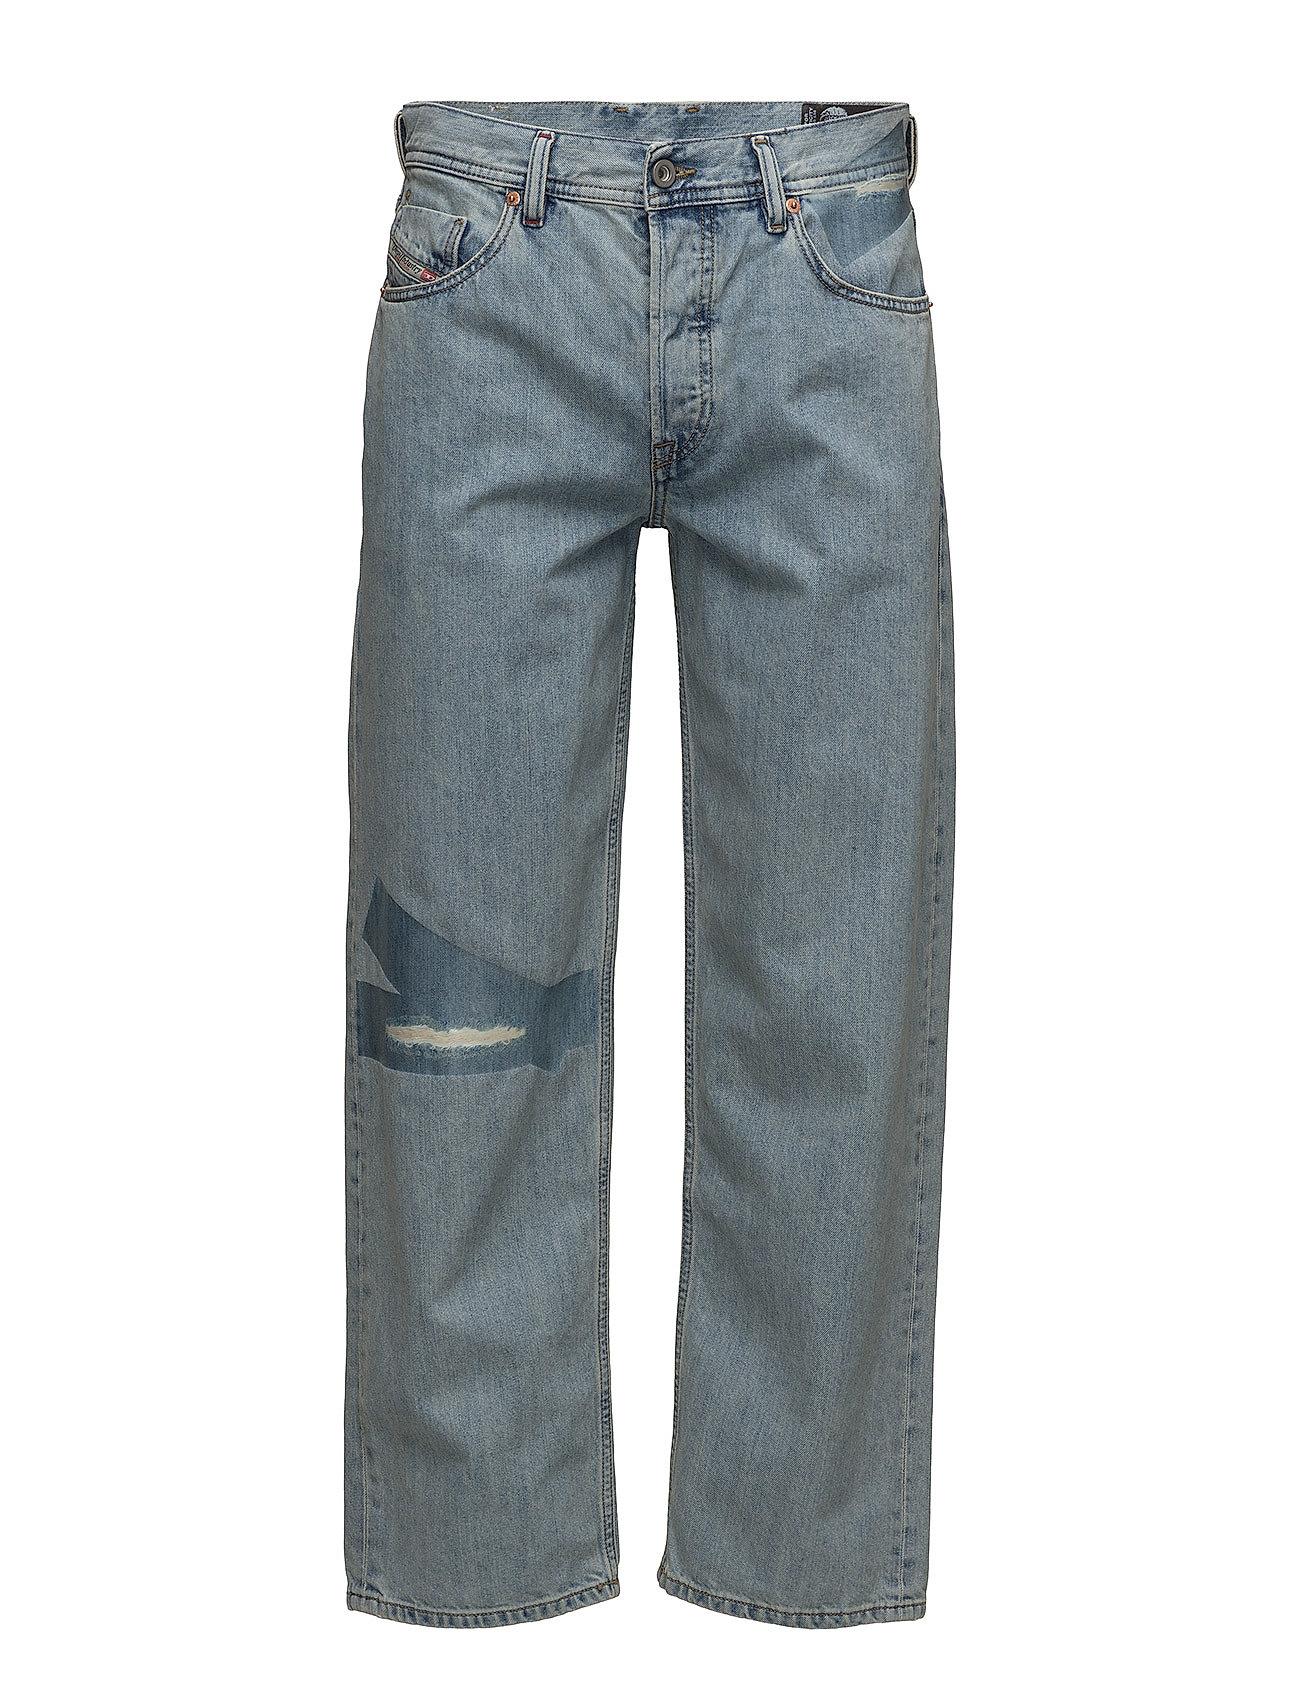 Dagh L.32 Trousers - Diesel Men